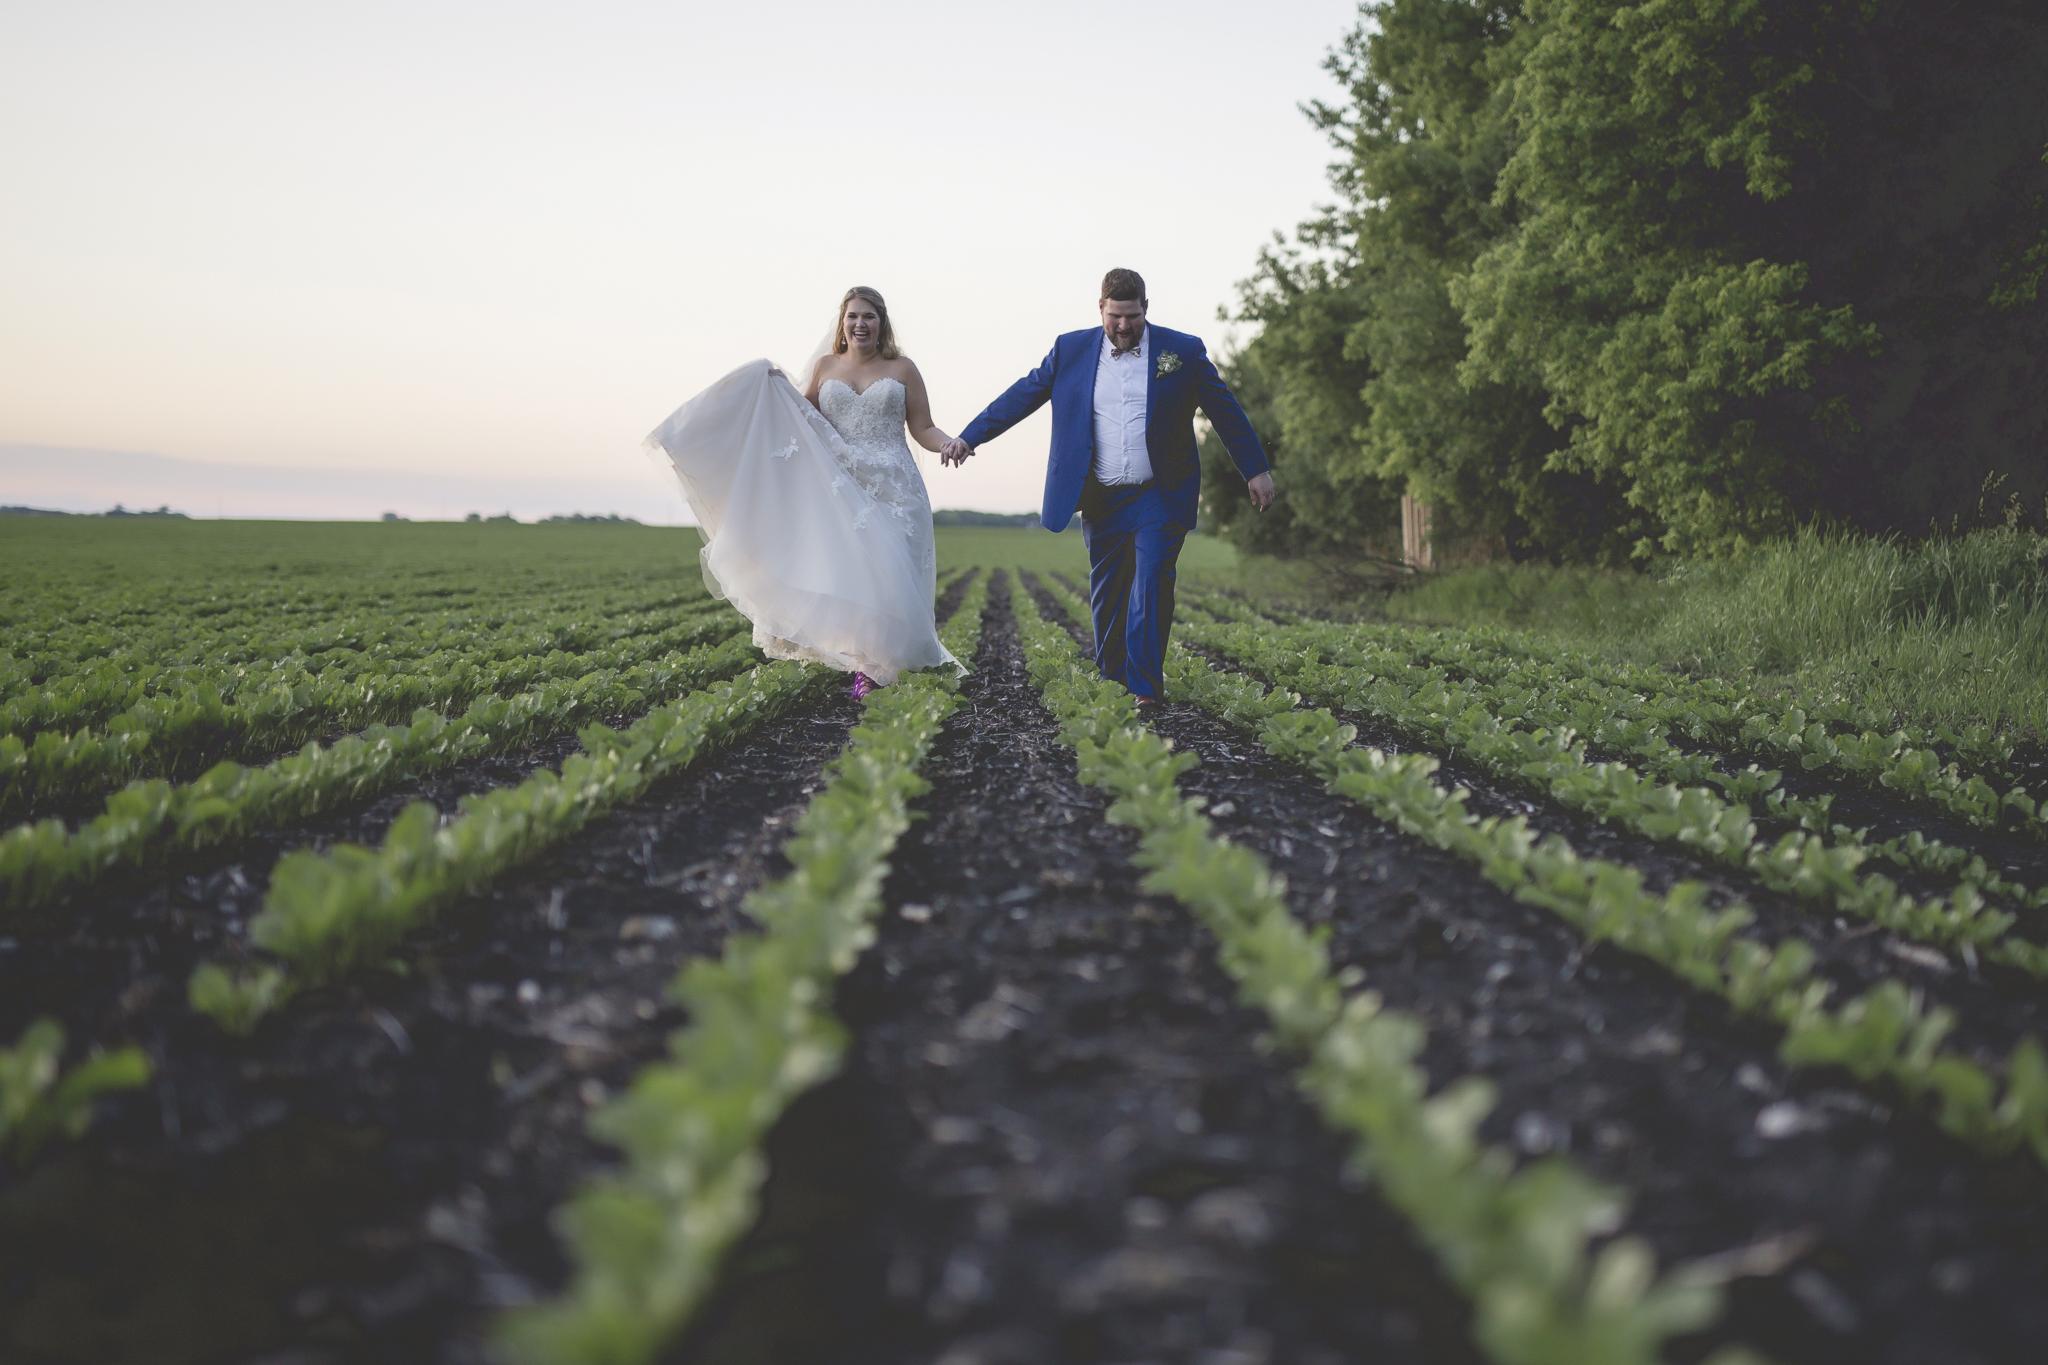 minnesota family farm outdoor wedding photographer-12.jpg